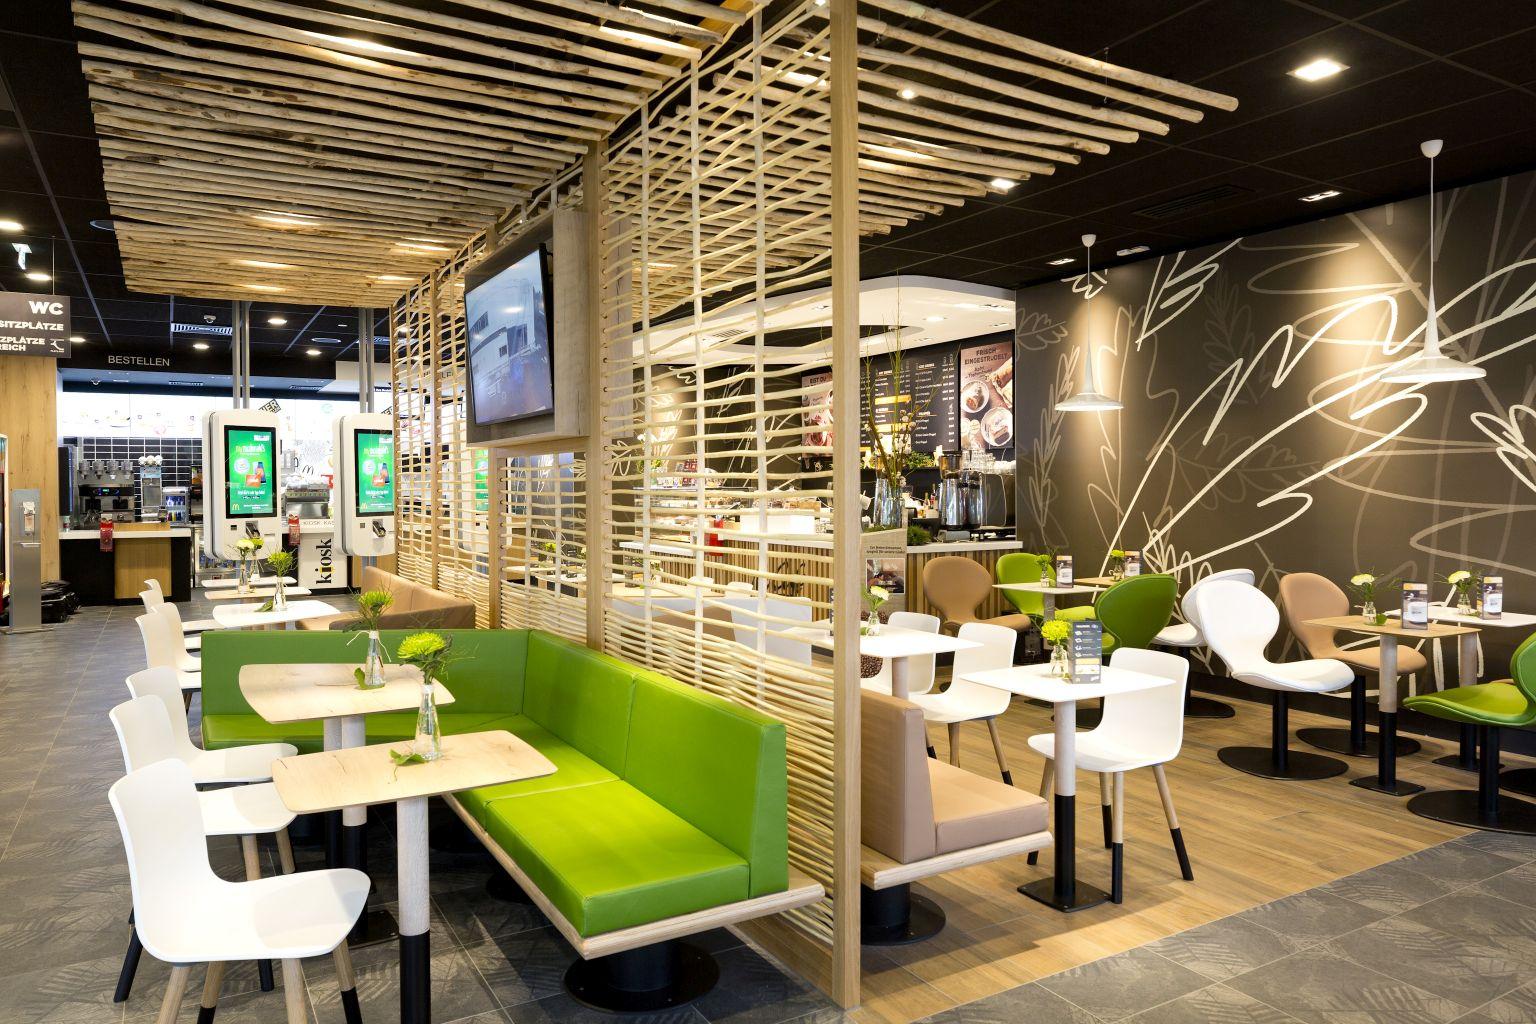 Lustenau, 19.11.2016 McDonalds, neu, Architektur, Gebaeude, Eroeffnung